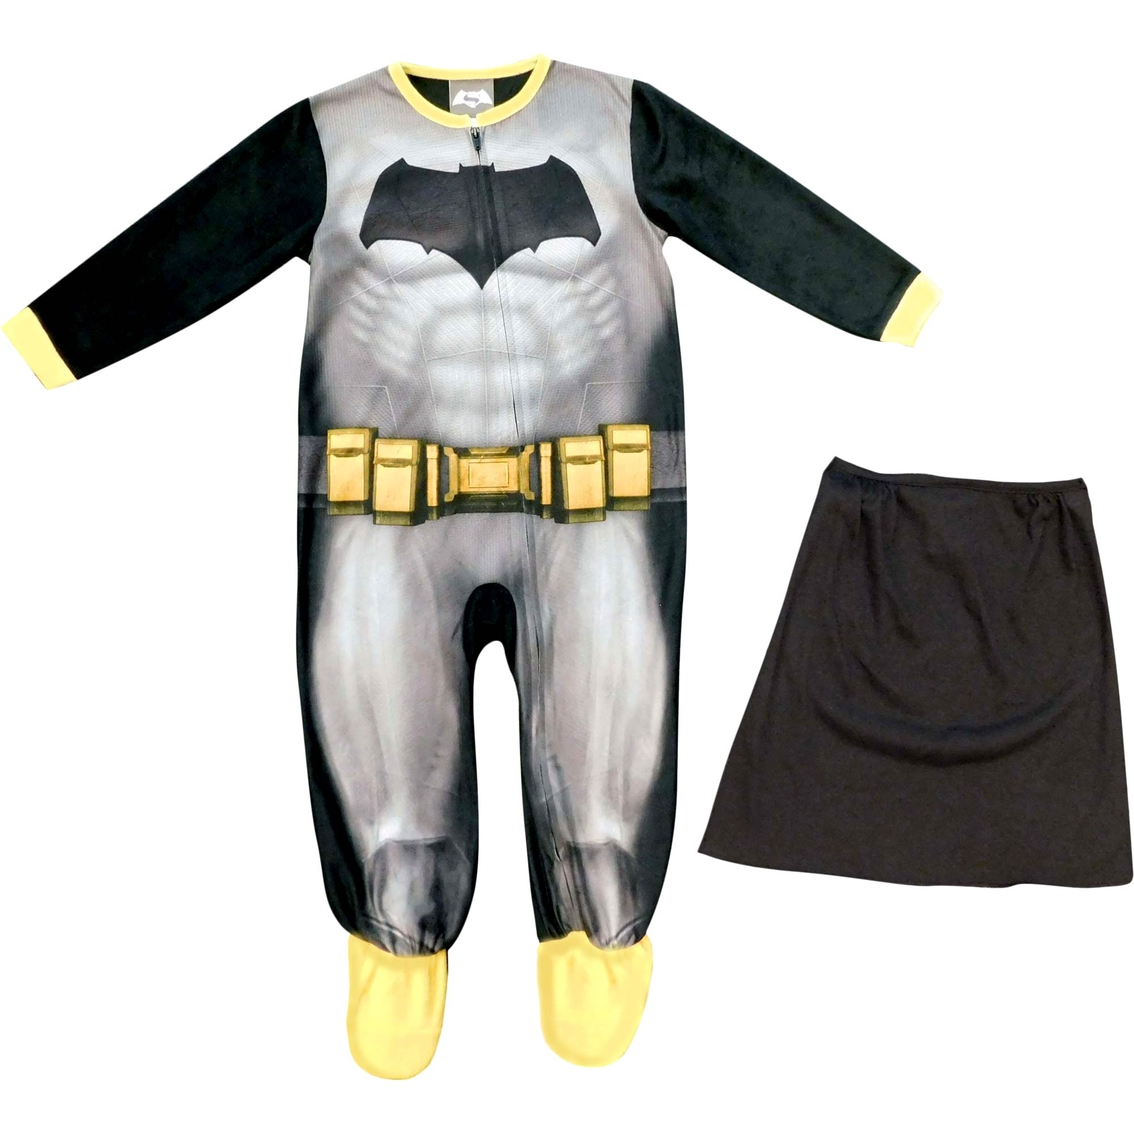 Gentle Dc Comics Batman Spandex Superhero Costume Women's Costumes